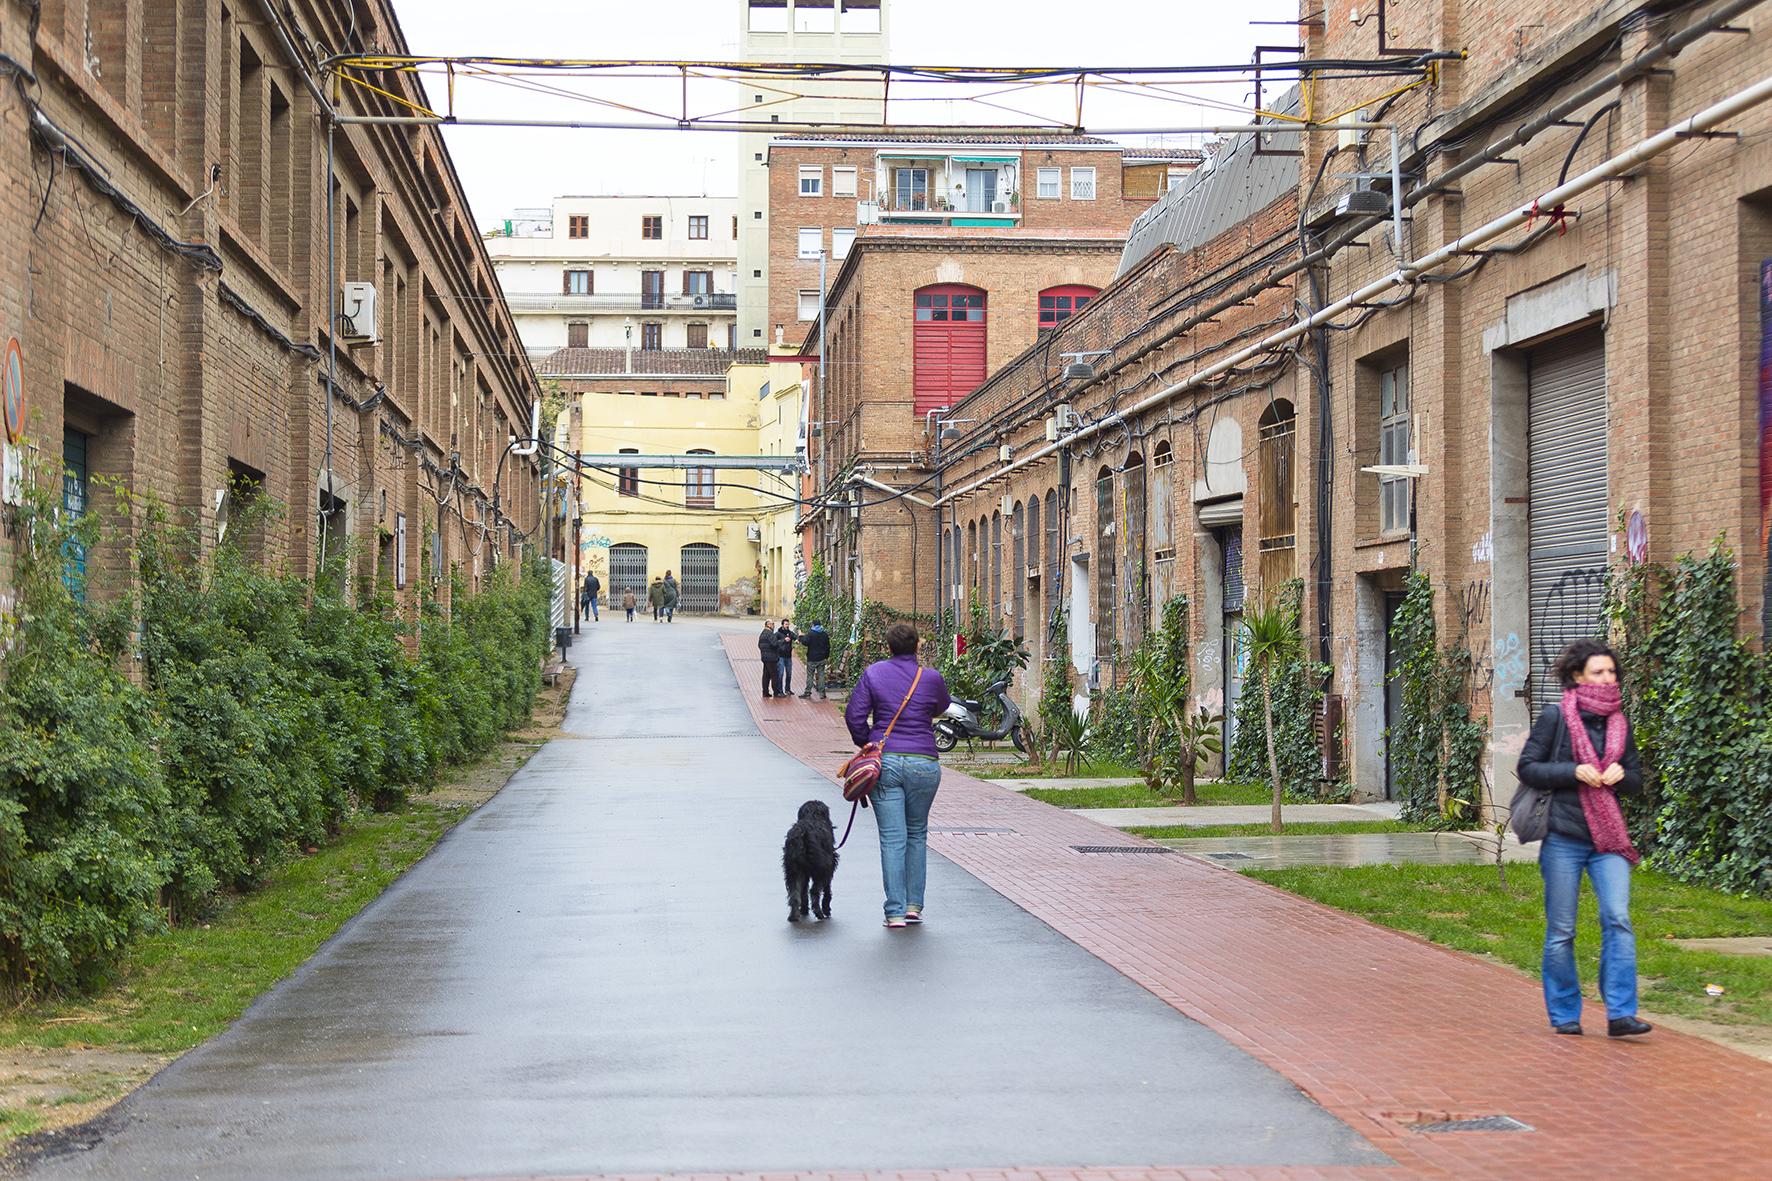 Provisional urbanization of Can Batlló